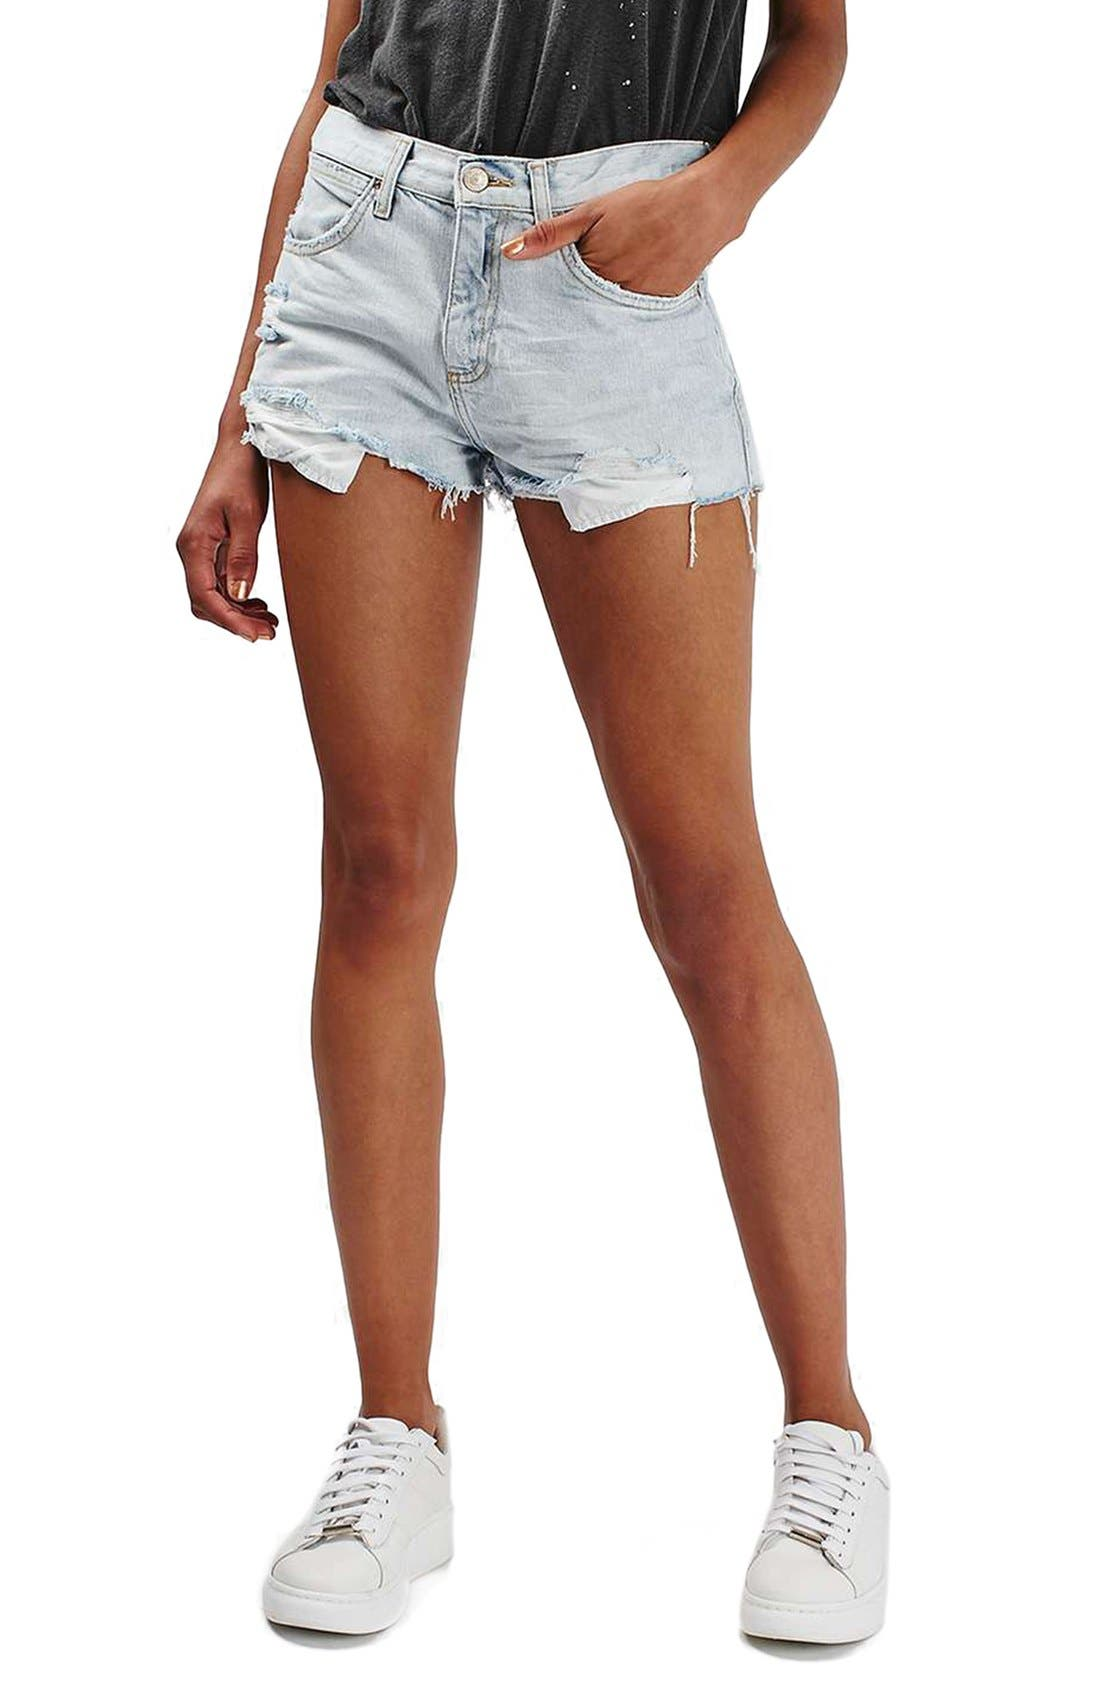 Alternate Image 1 Selected - Topshop 'Rosa' Cutoff Denim Shorts (Petite)